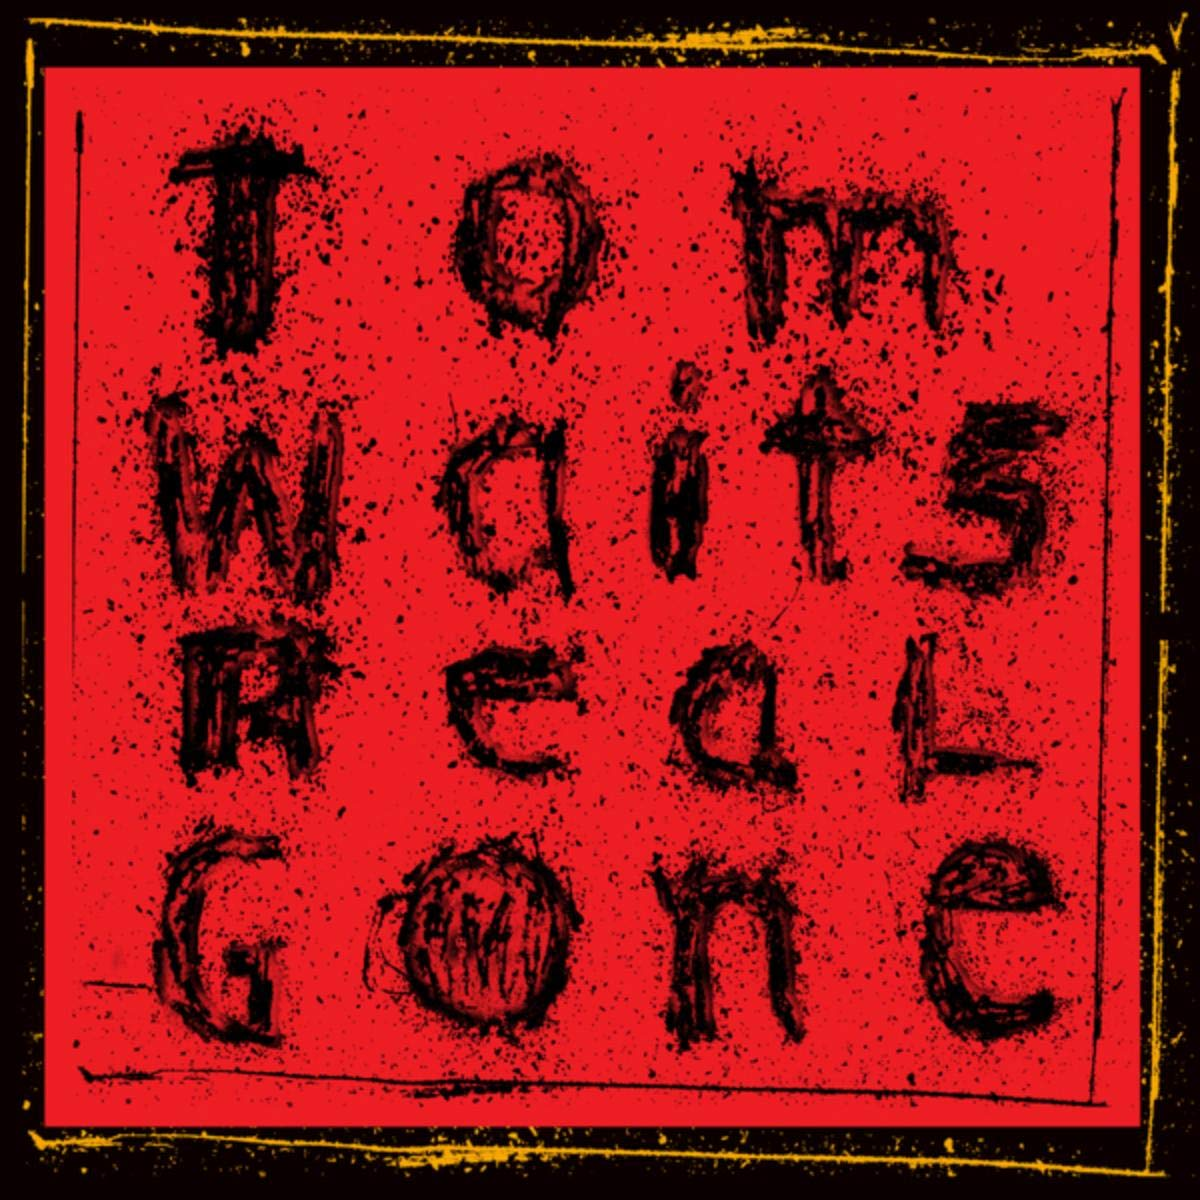 Tom Waits - Real Gone (2004) [FLAC] Download